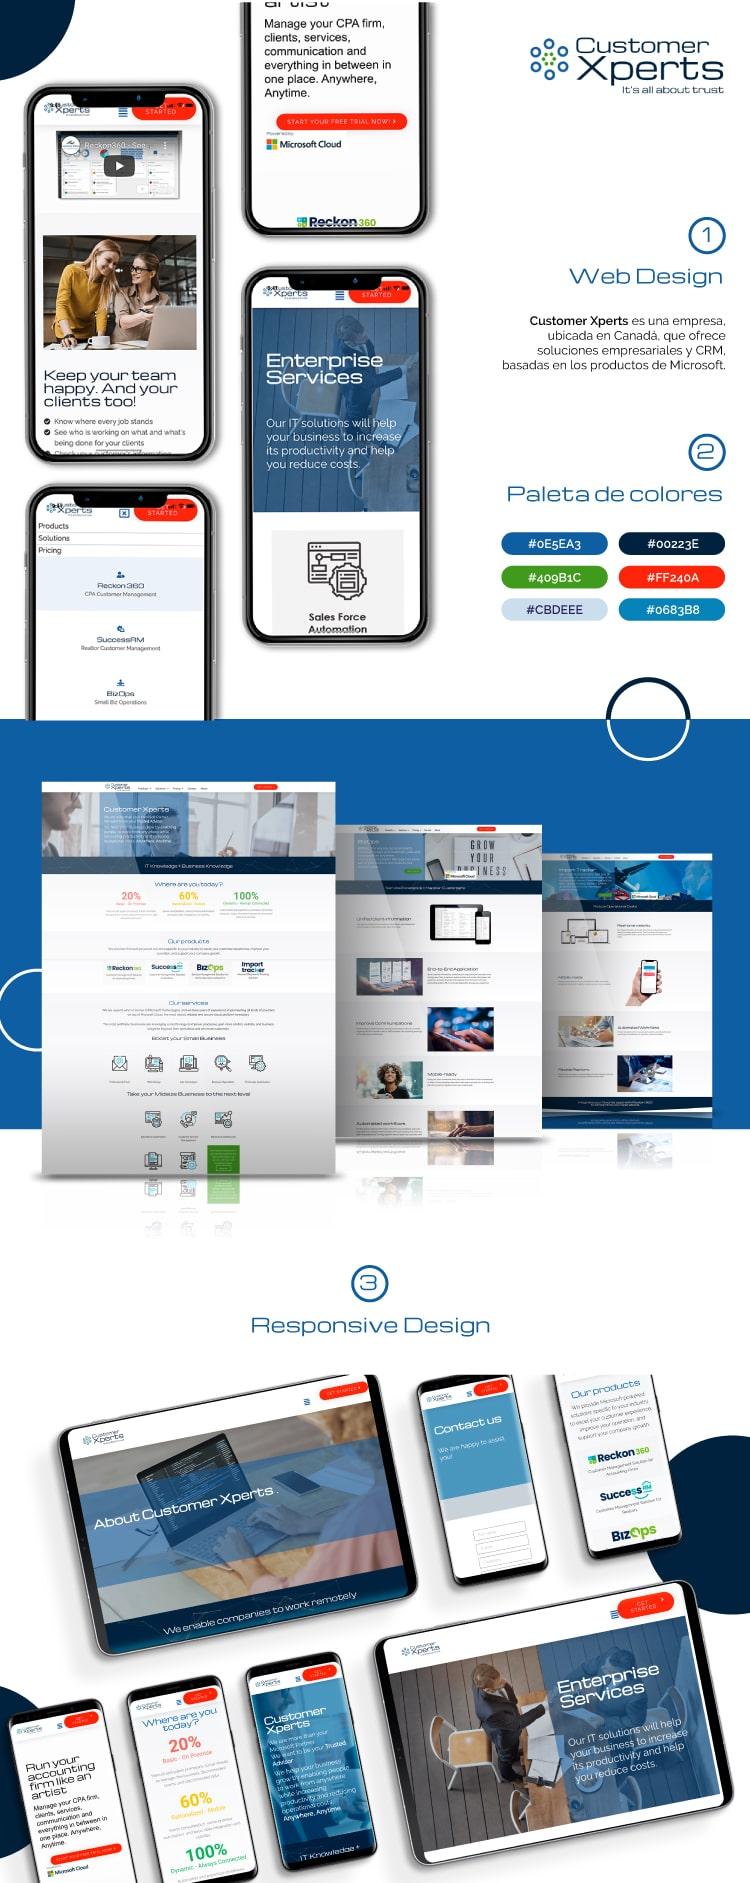 customer-xperts-portafolio